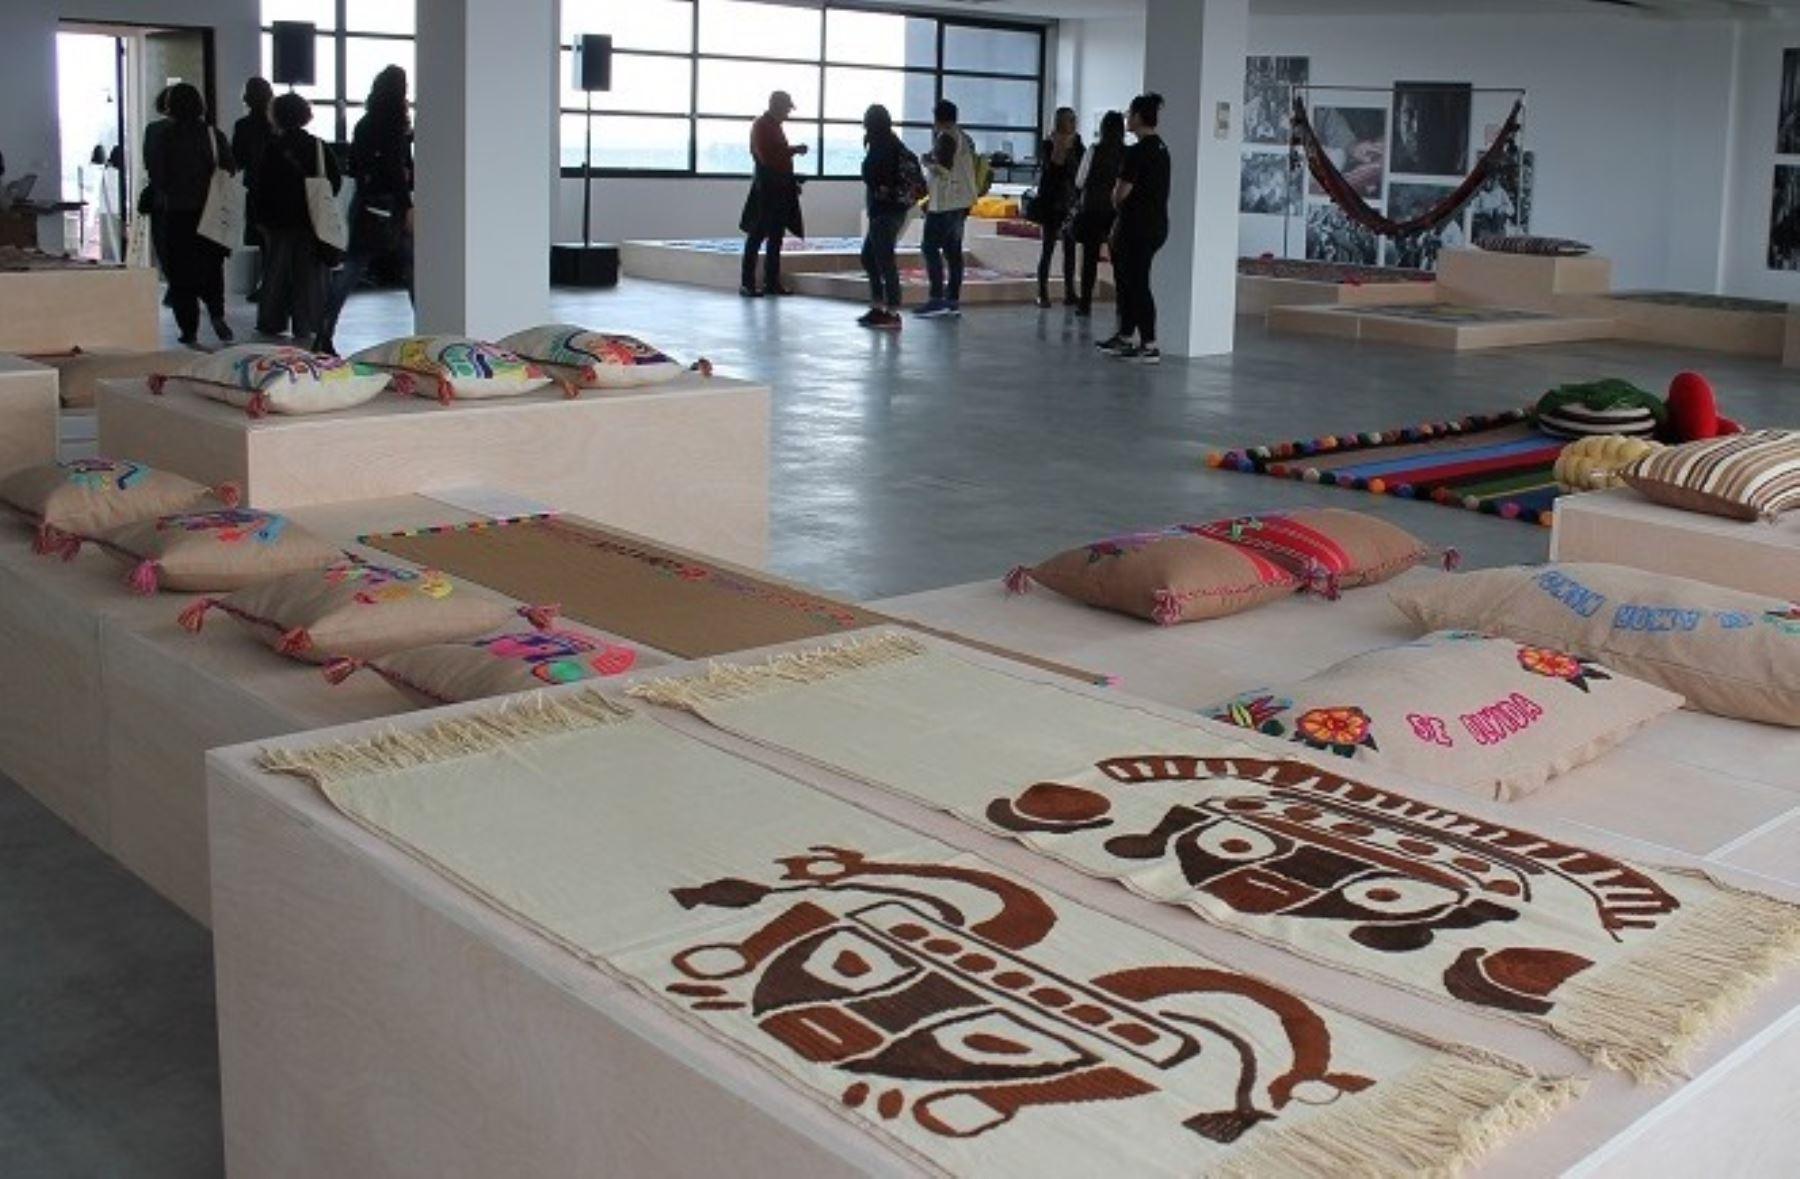 Colecci n de textiles elaborado por artesanos peruanos se - Disenos textiles del mediterraneo ...